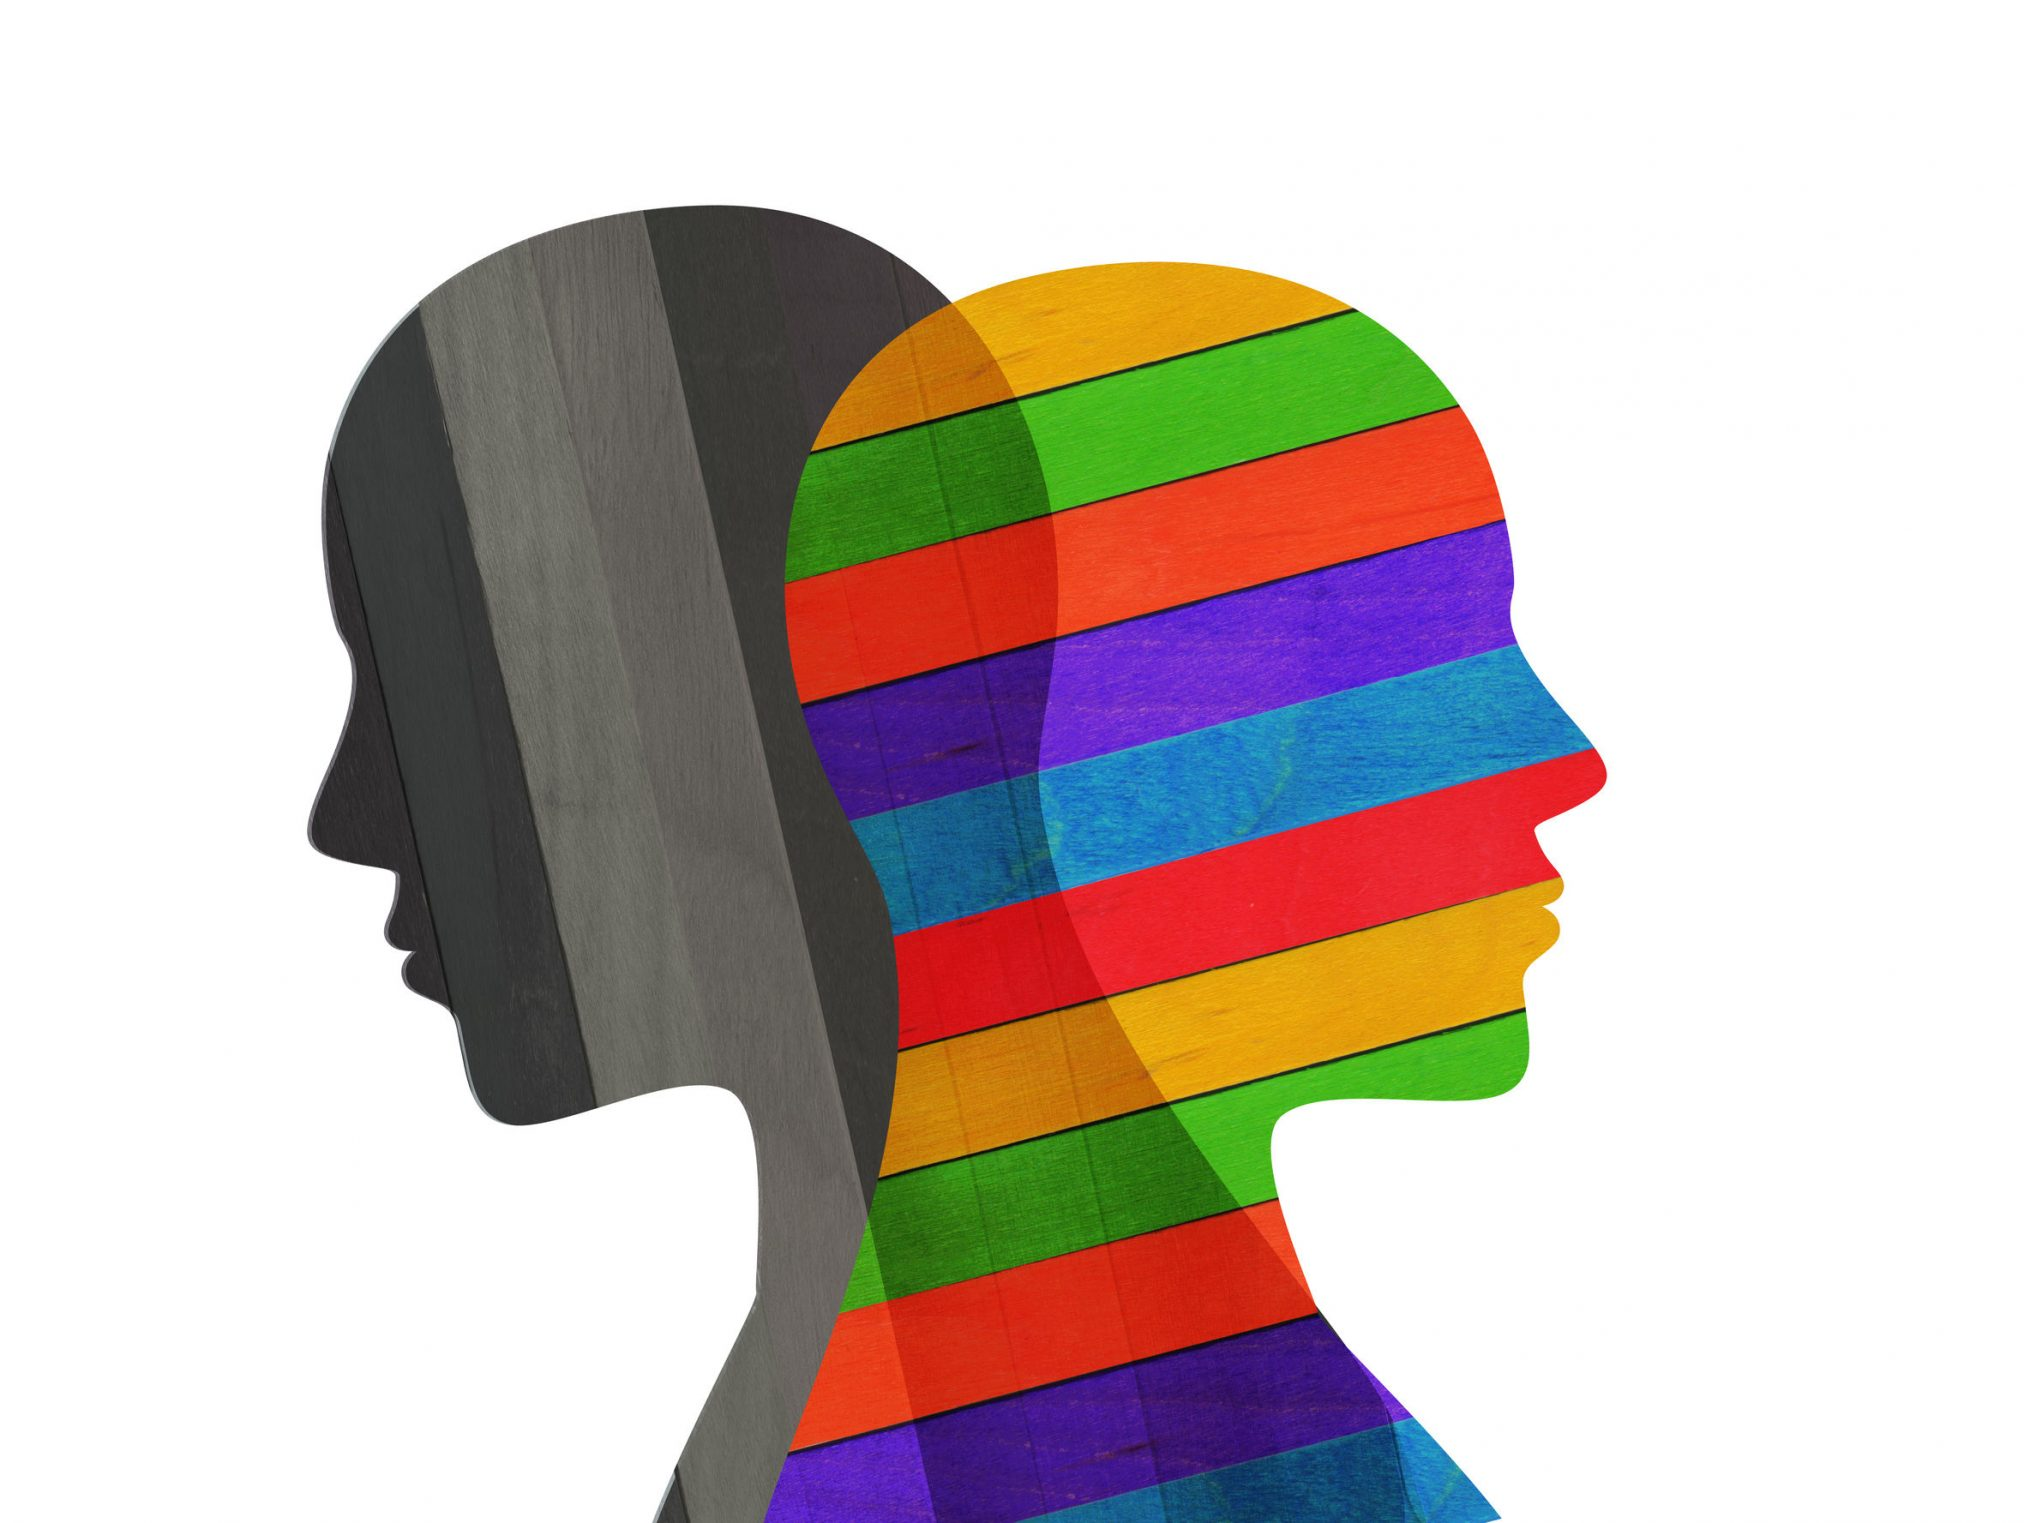 bipolar disorder mental health